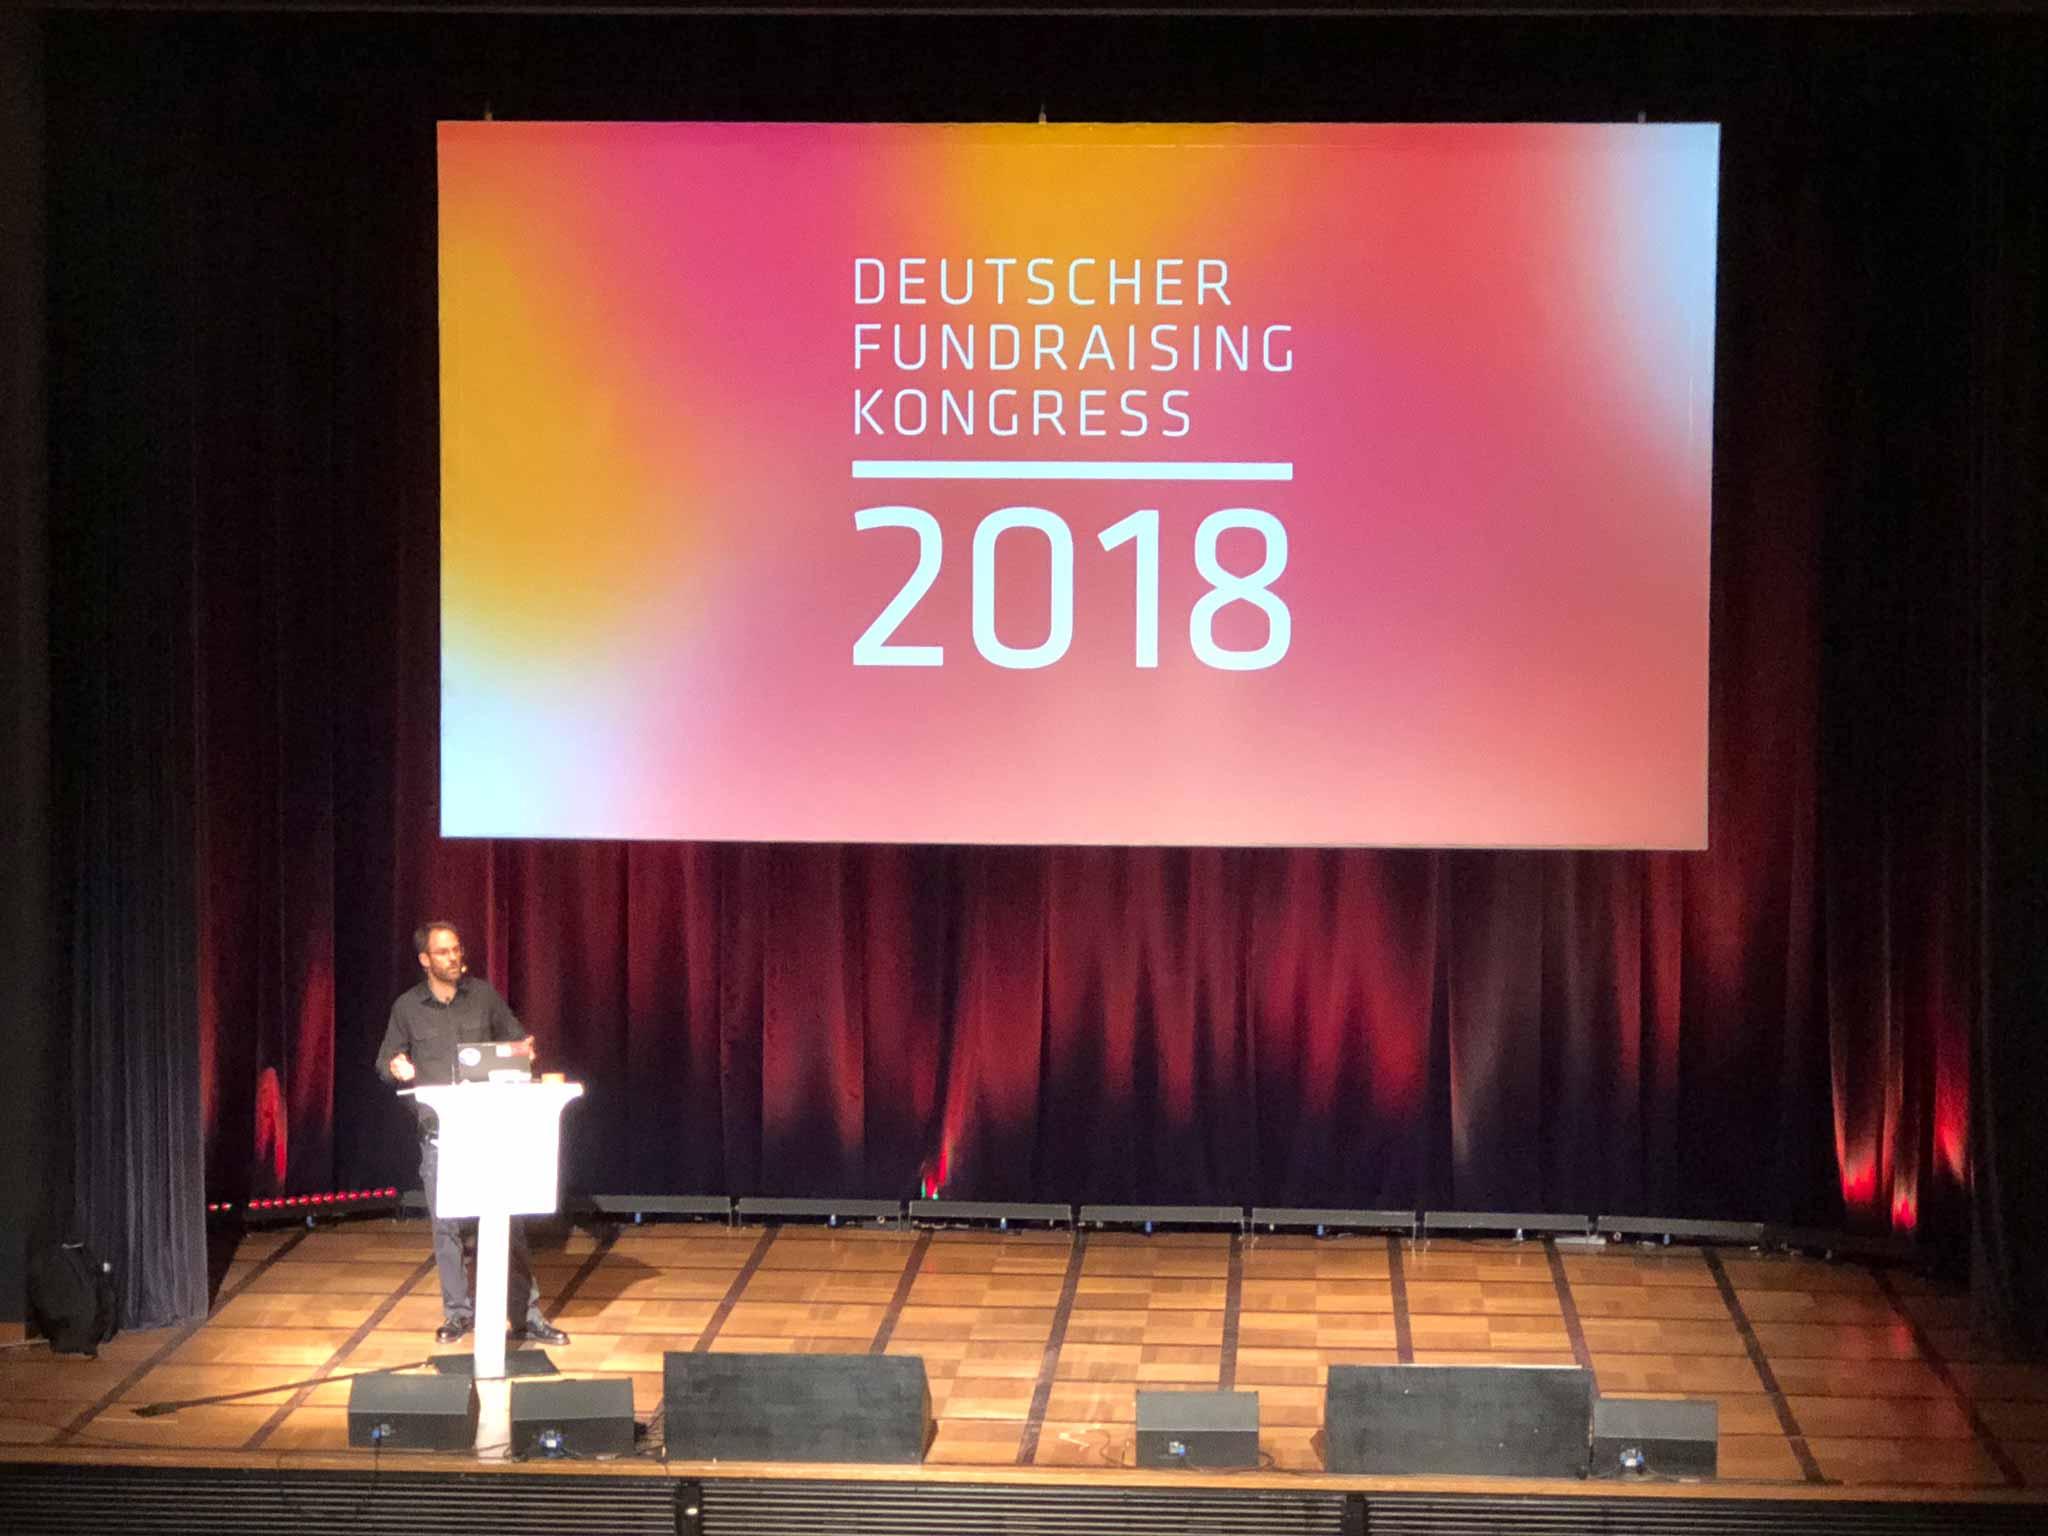 Daniel Domscheit-Berg eröffnet den Deutschen Fundraising Kongress 2018.